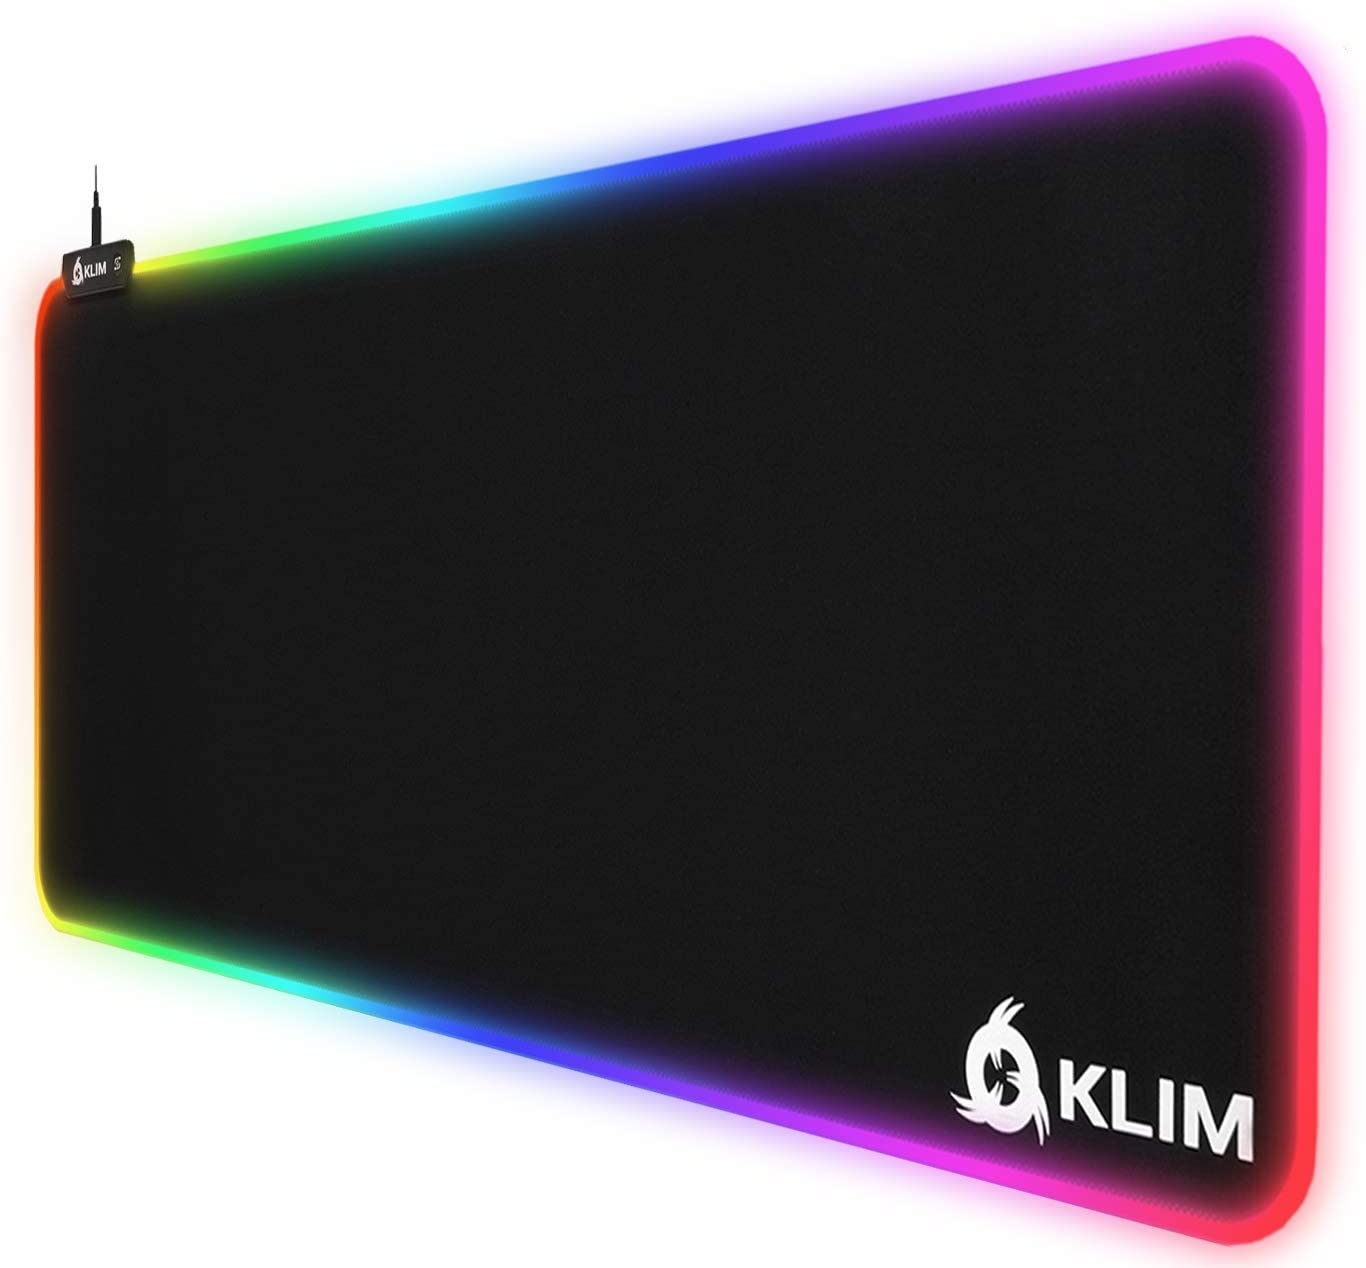 KLIM Supremacy - Alfombrilla de ratón RGB Extra Grande - Nueva 2021 - Superficie extendida (XL) - Tela de Alta precisión - Alfombrilla de ratón Muy Grande con Luces, USB - 786 x 300 x 3 mm